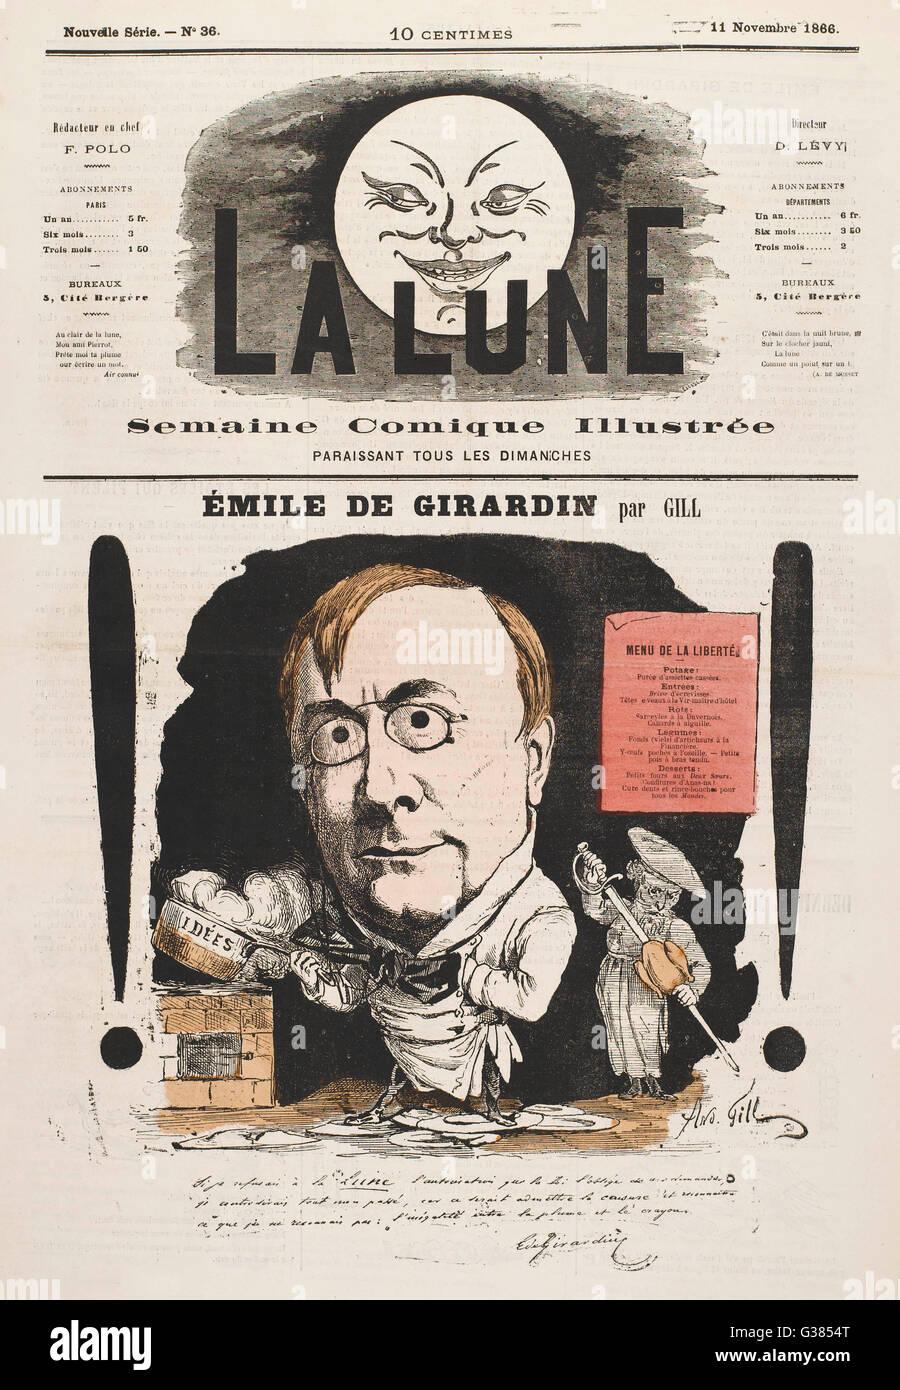 EMILE DE GIRARDIN  French journalist        Date: 1806 - 1881 Stock Photo